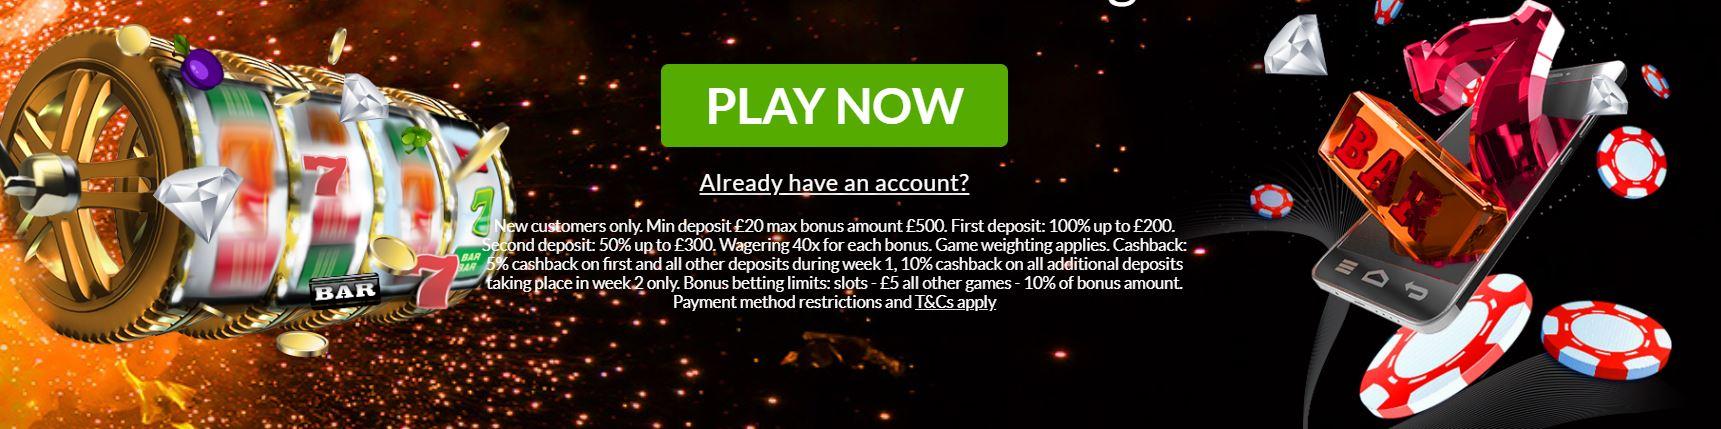 Podrás jugar de forma inmediata a casino online móvil.